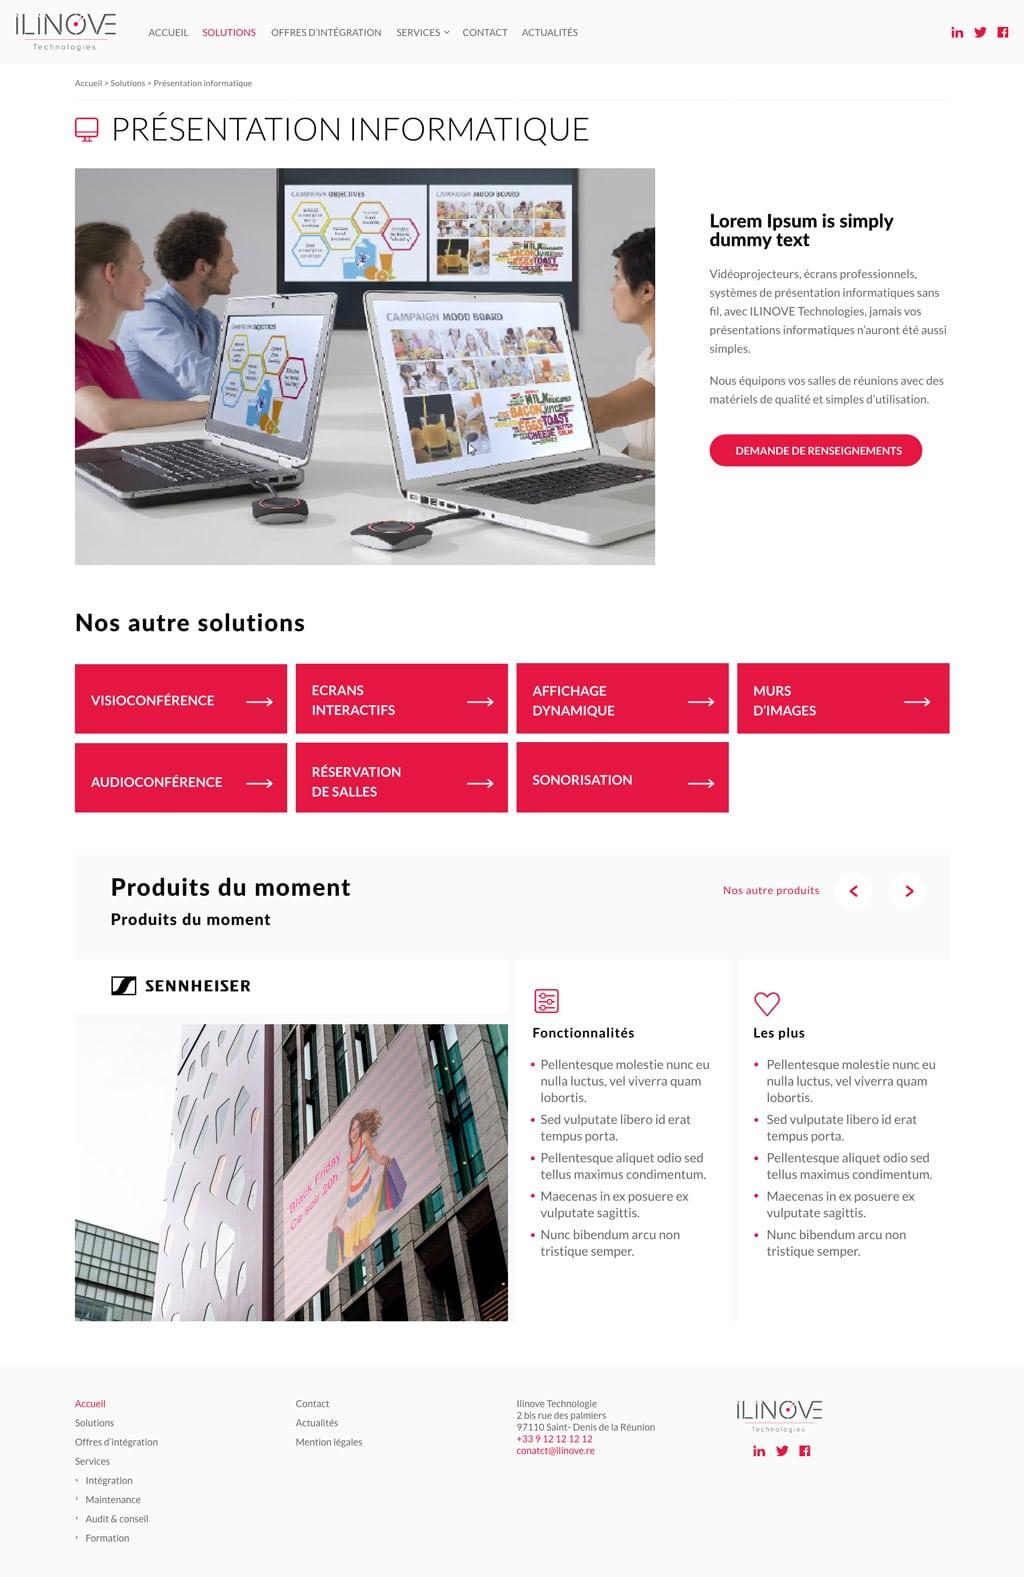 webdesign ui design adobe xd